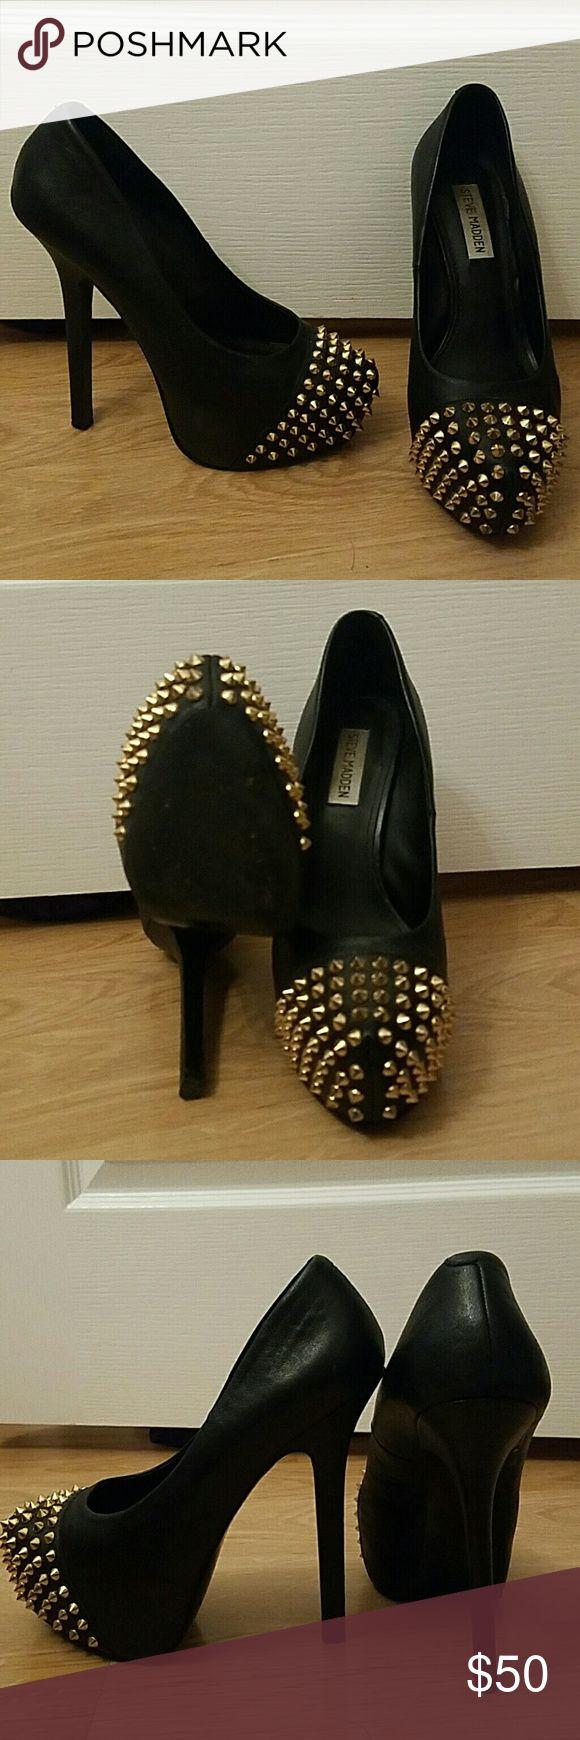 Steve Madden spiked heels 8 Sexy, black spiked heels. Steve Madden. Size 8. Gently used. Steve Madden Shoes Heels